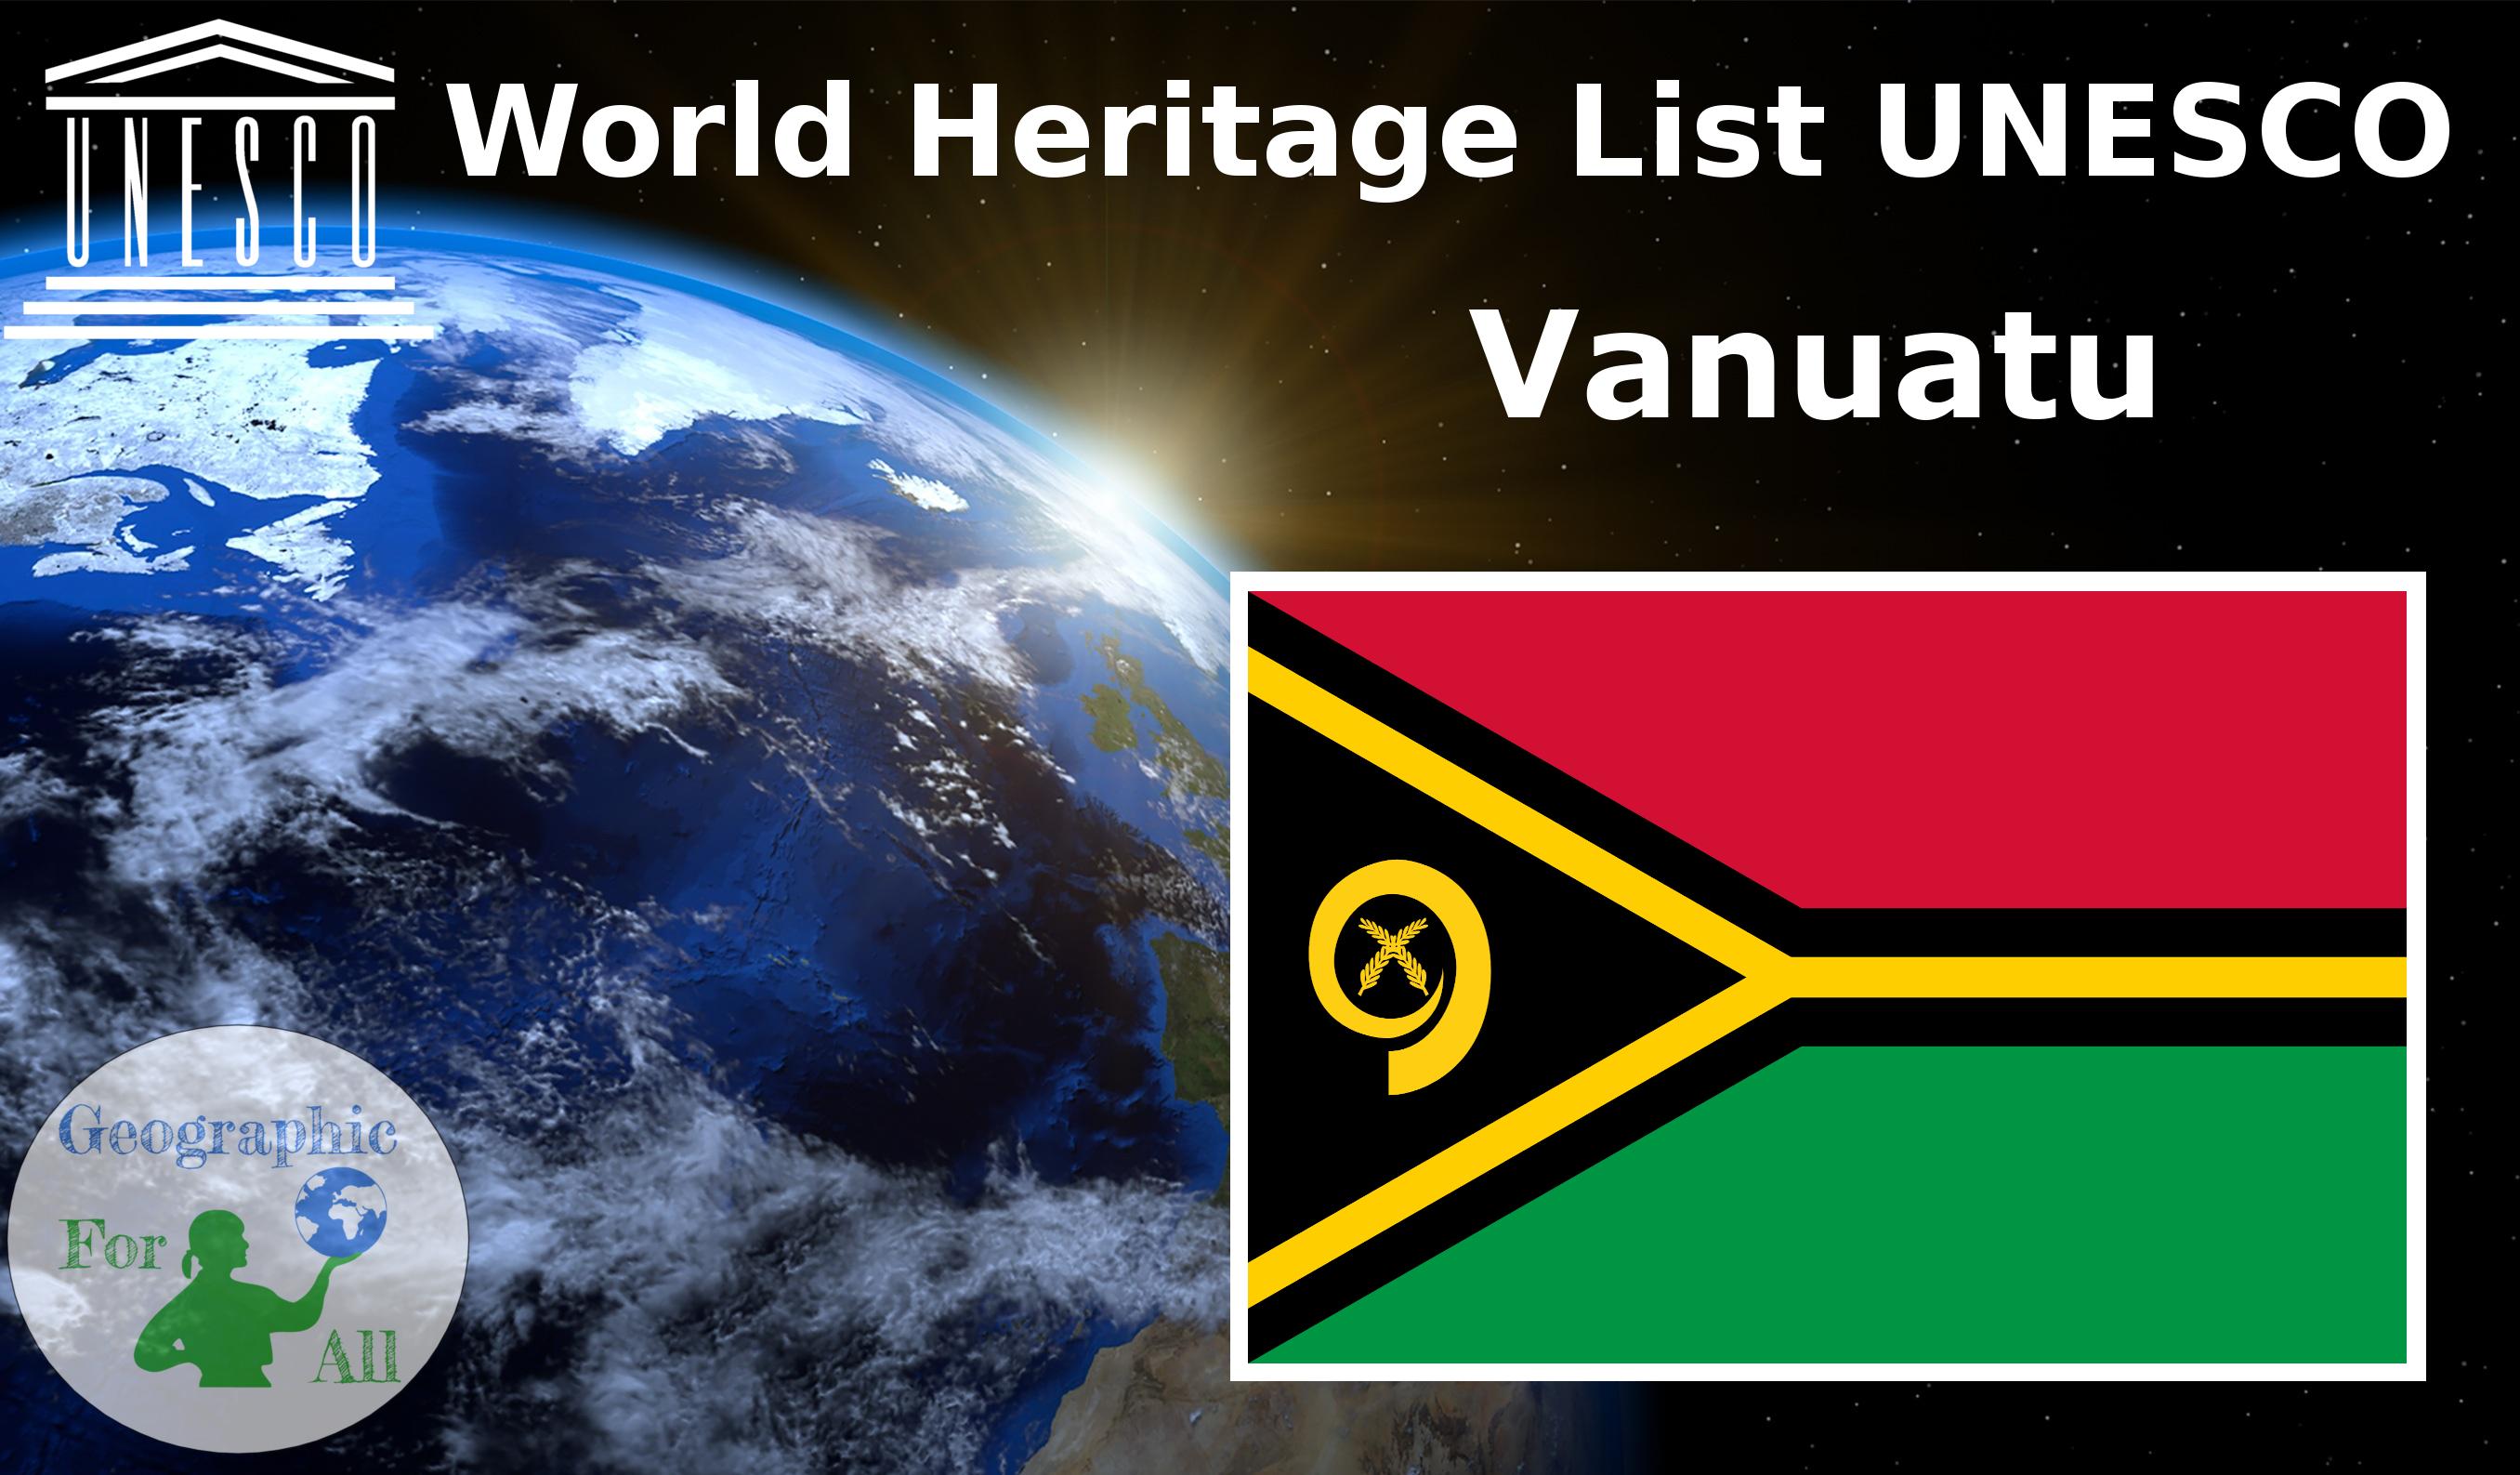 World Heritage List UNESCO - Vanuatu